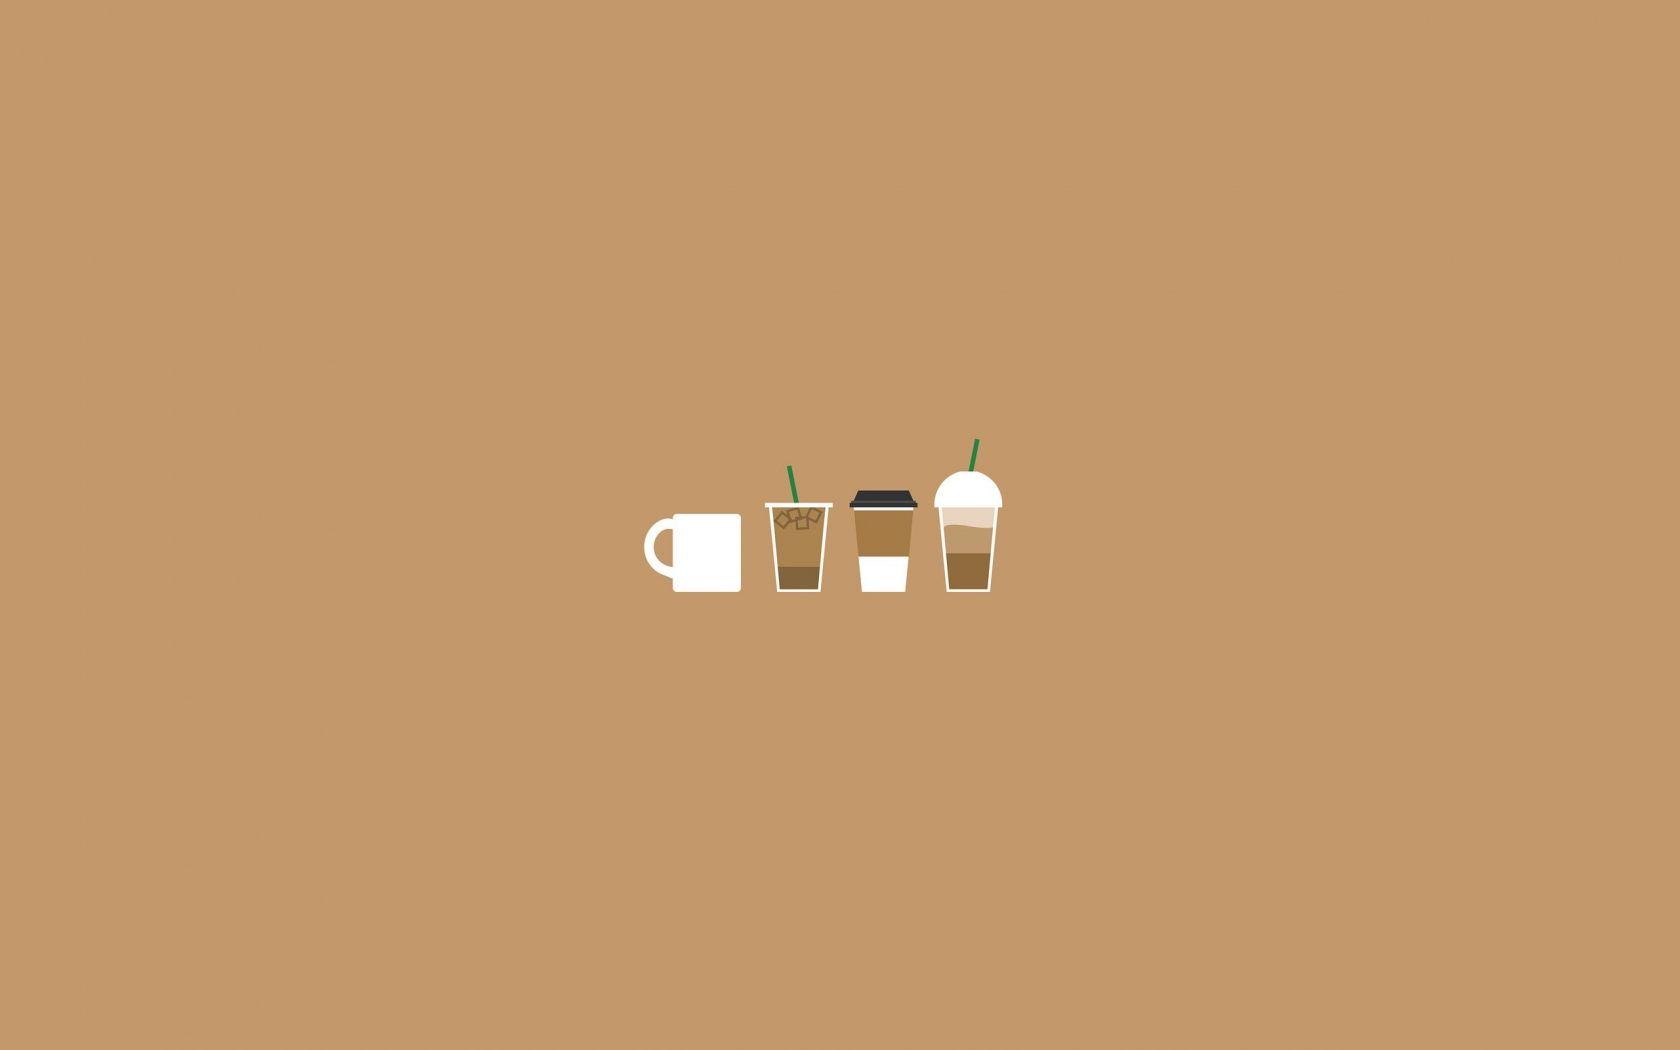 Macbook Screensaver Laptop Screensaver Blush Wallpaper Aesthetic Neutral Minimalist 2021 Desktop Wallpaper Calendar Digital Download Drawing Illustration Art Collectibles Minyamarket Com